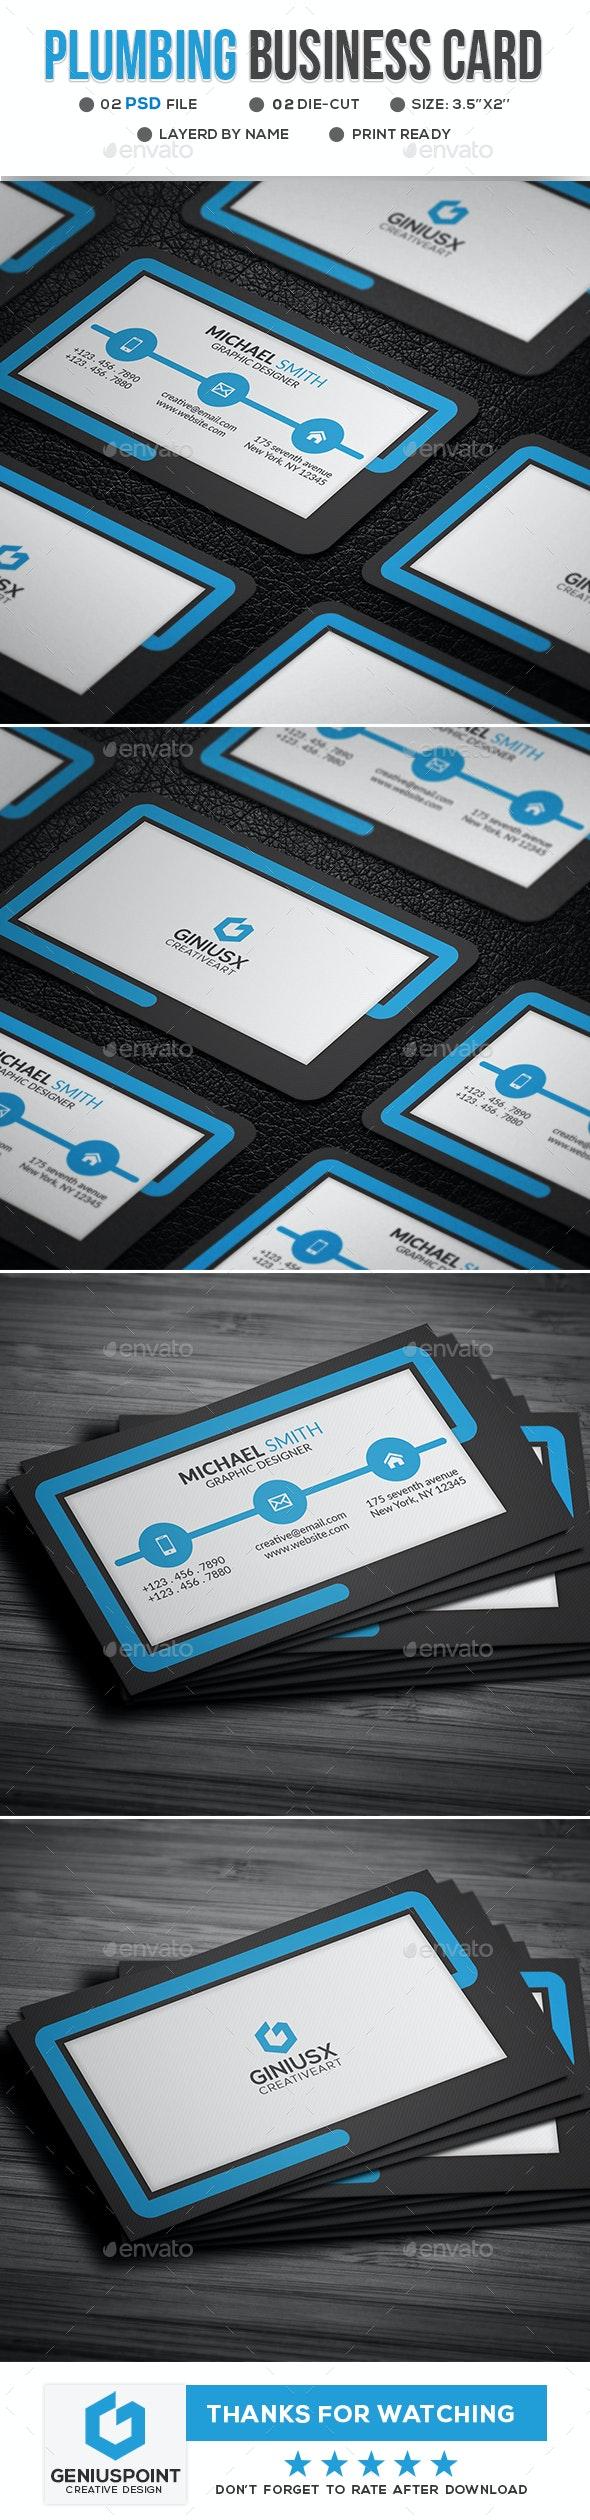 Plumbing Business Card - Business Cards Print Templates